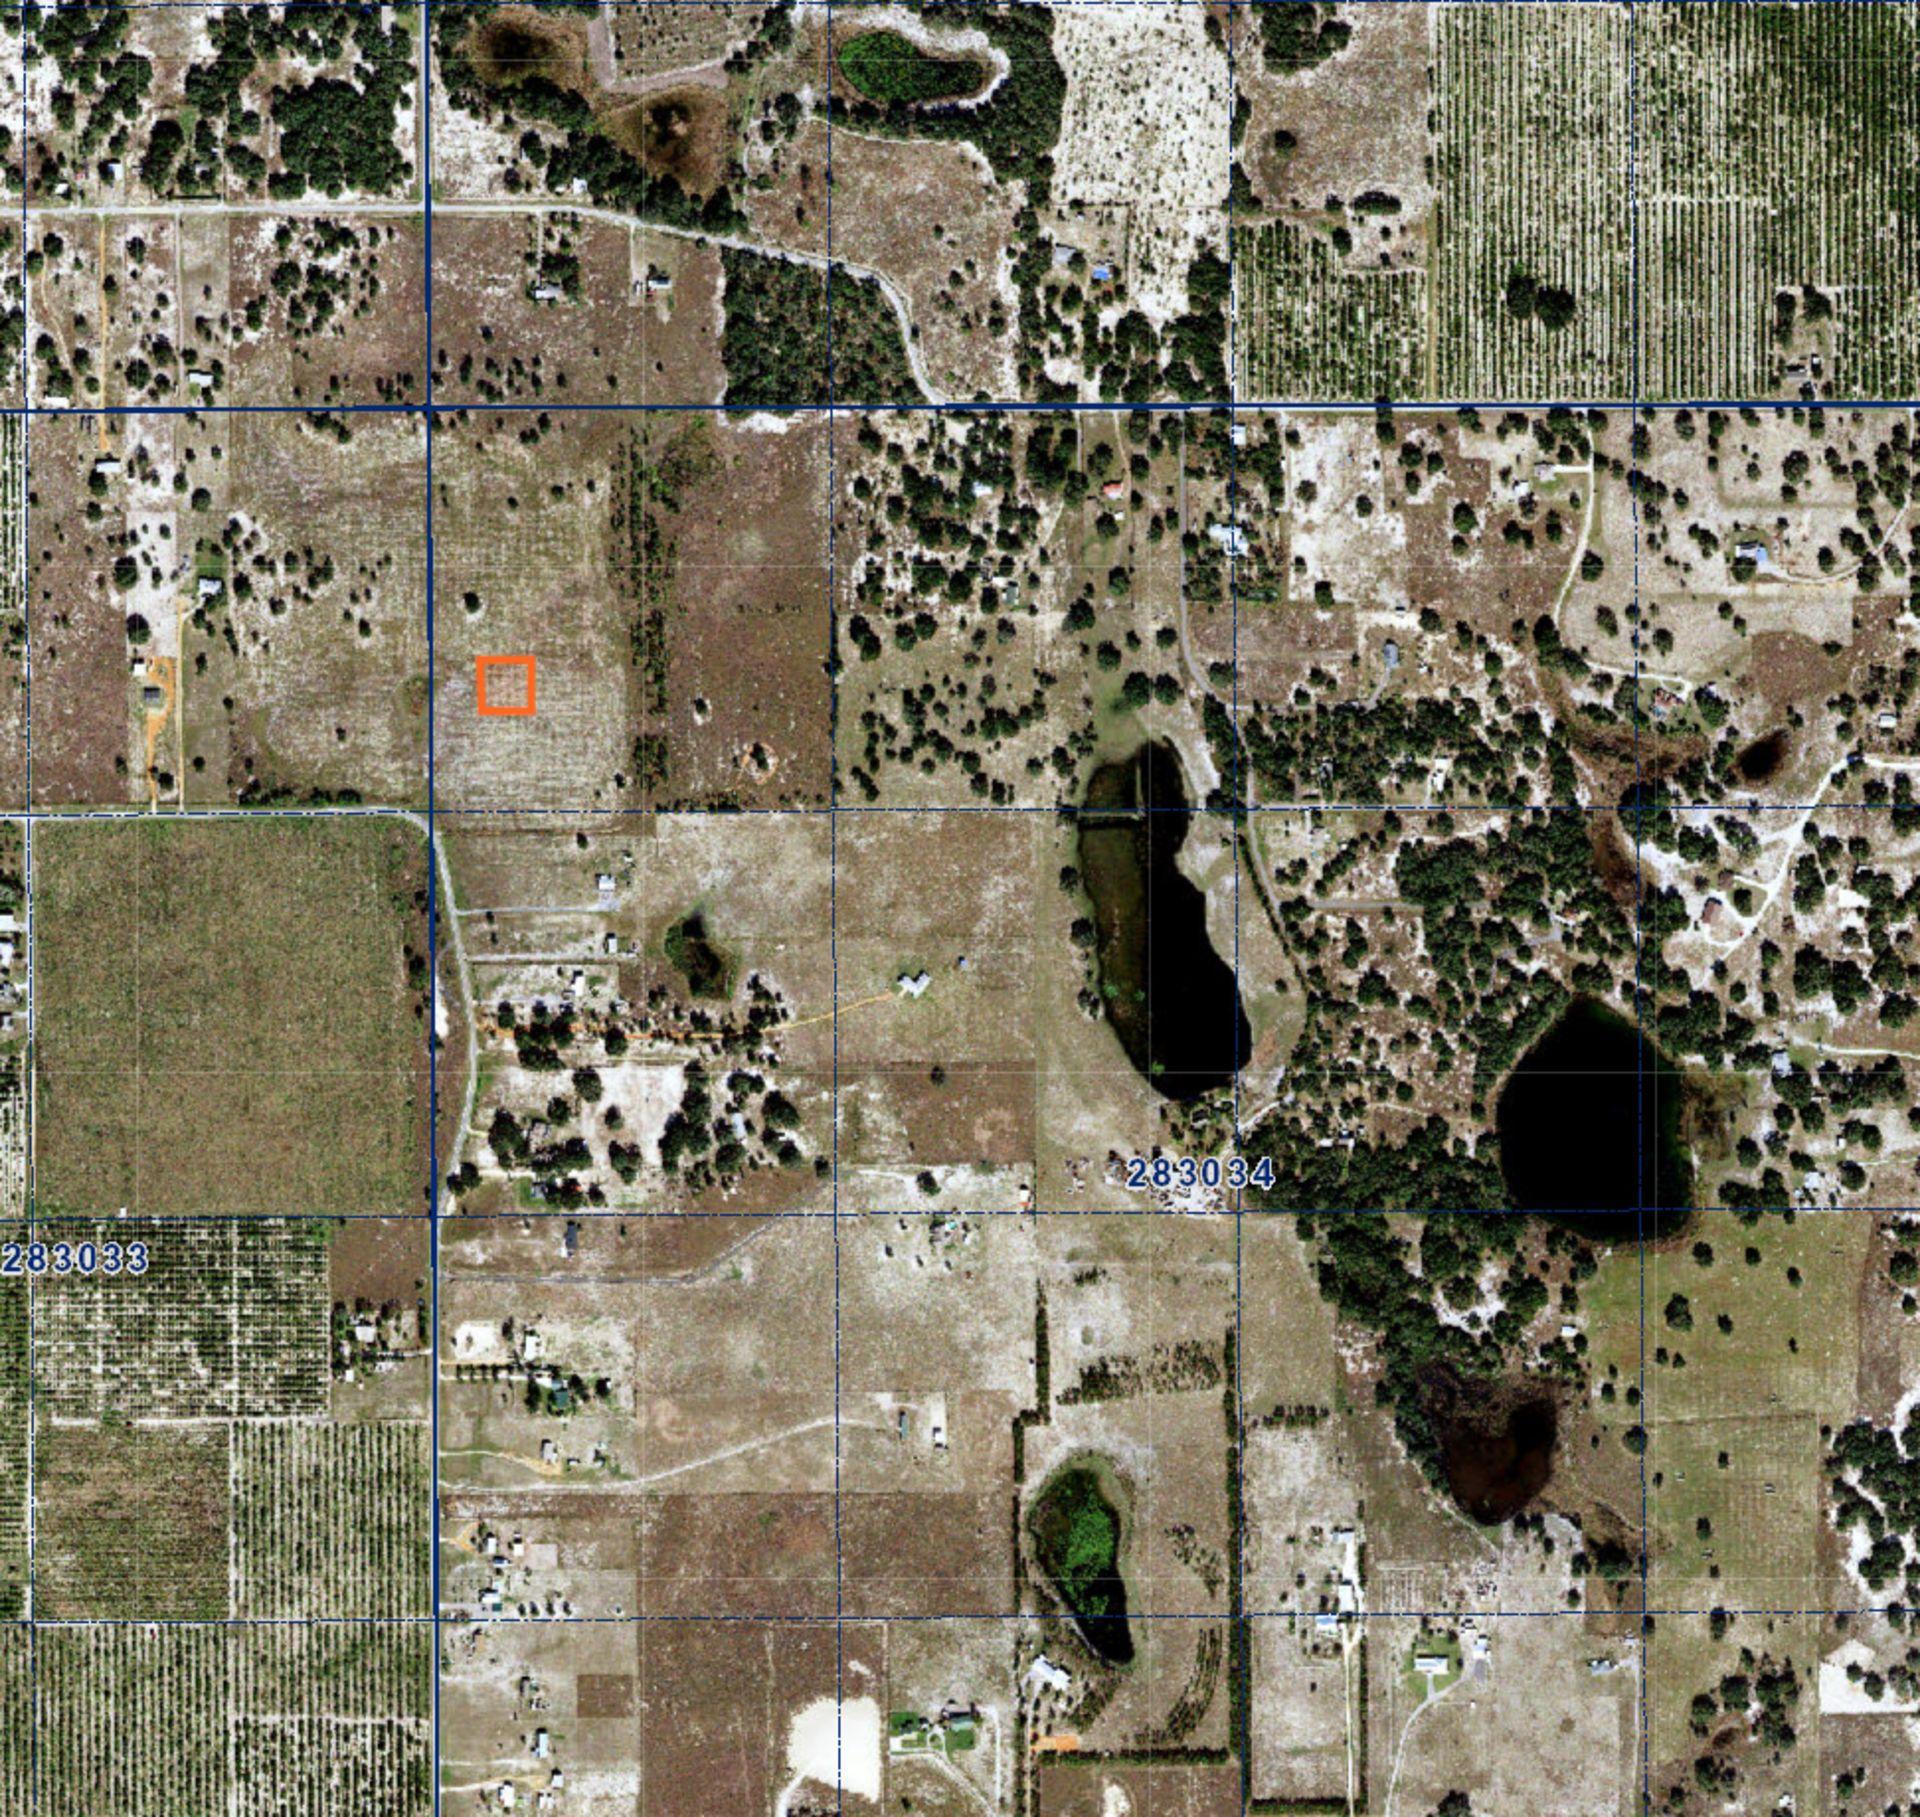 Peaceful Polk County, Florida! - Image 3 of 6